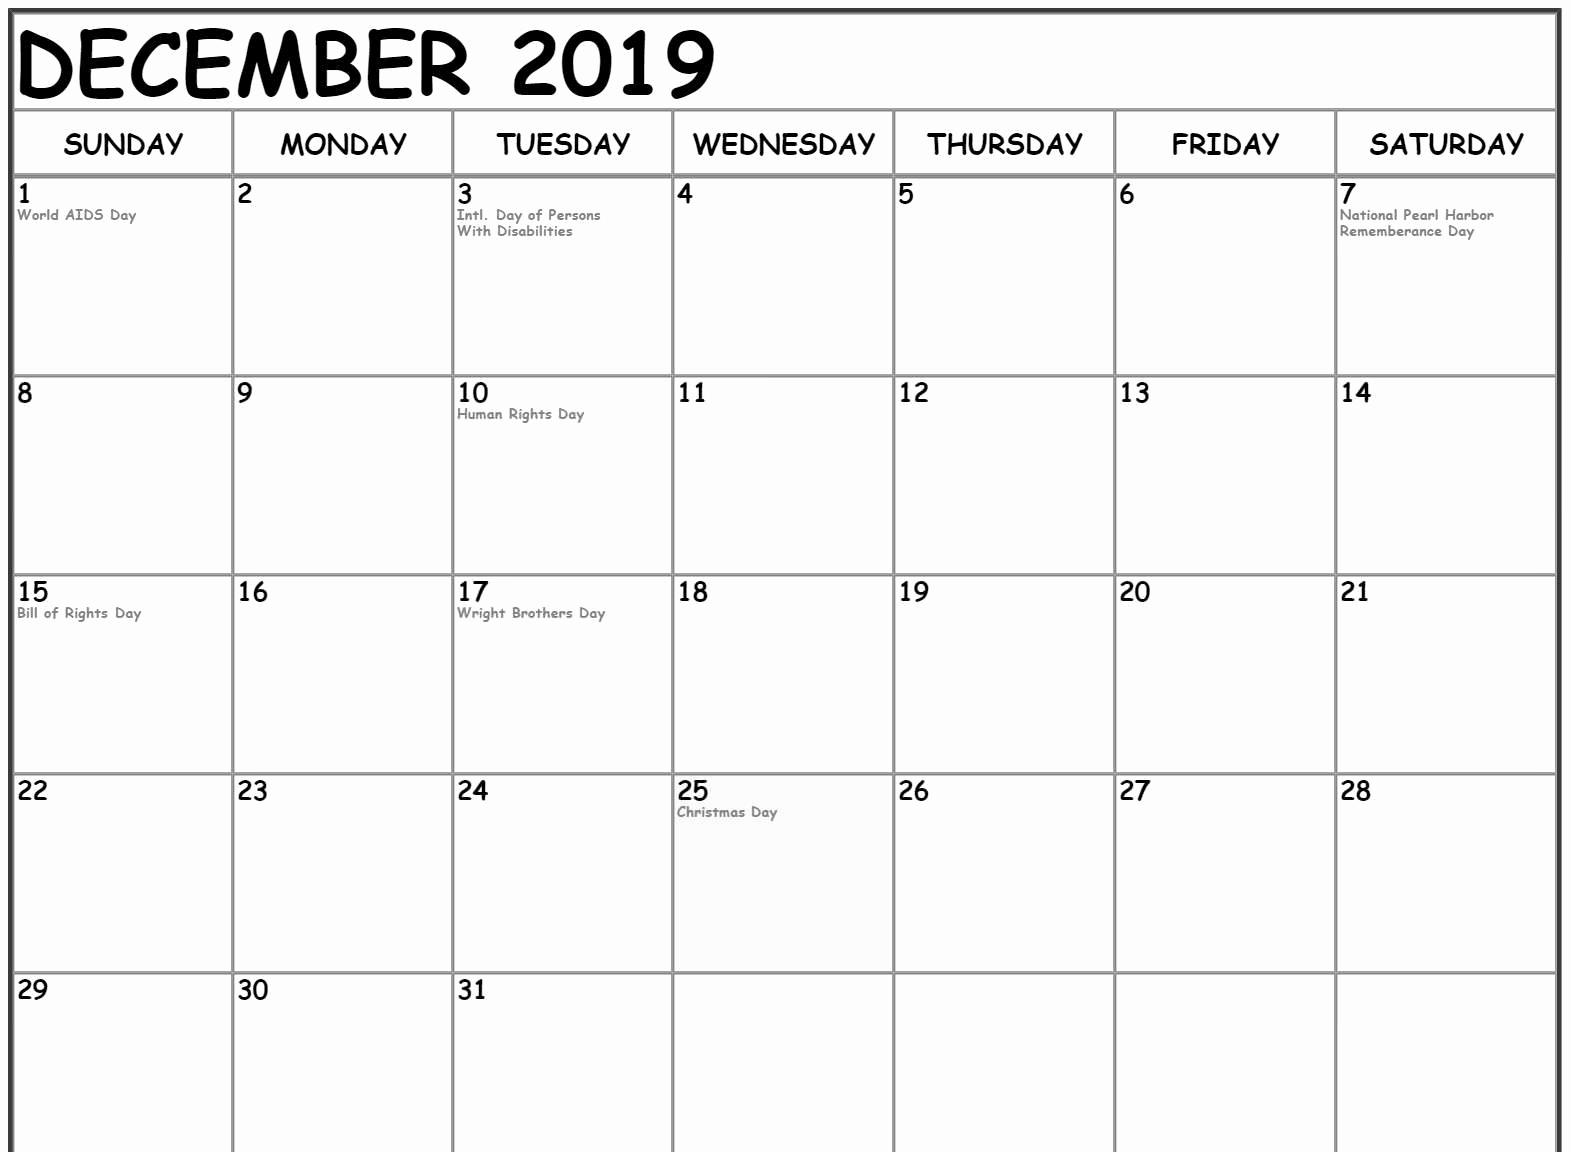 December 2019 Calendar With Holidays Canada